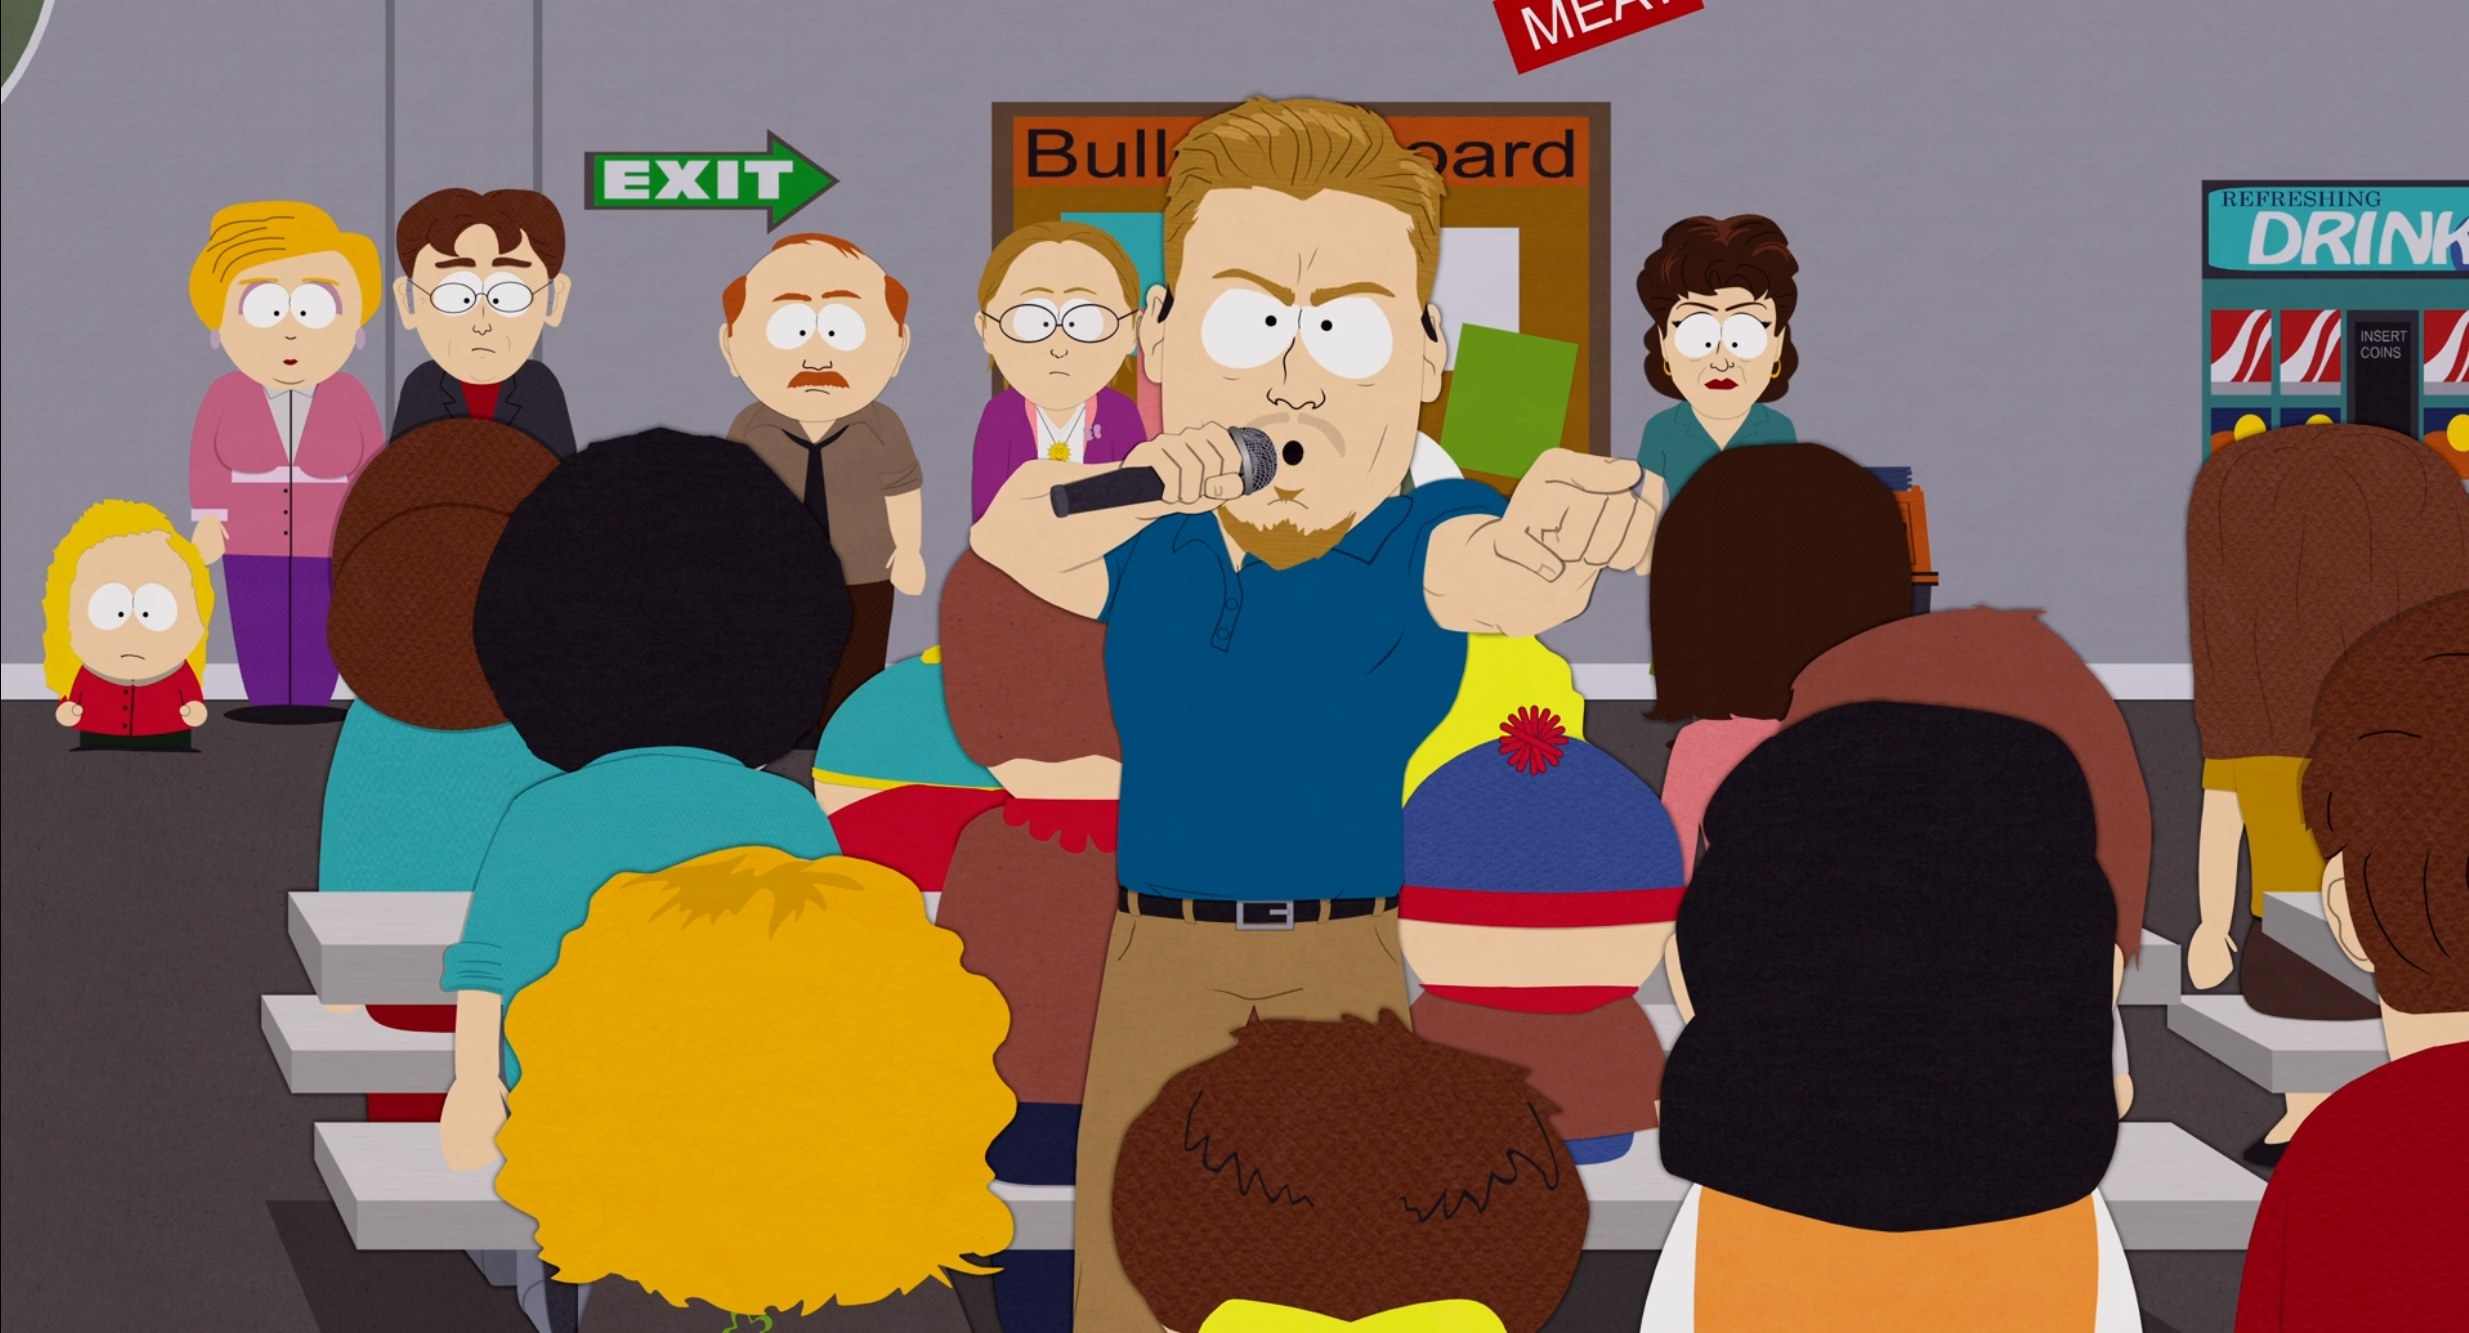 PC Principal introduces changes to South Park